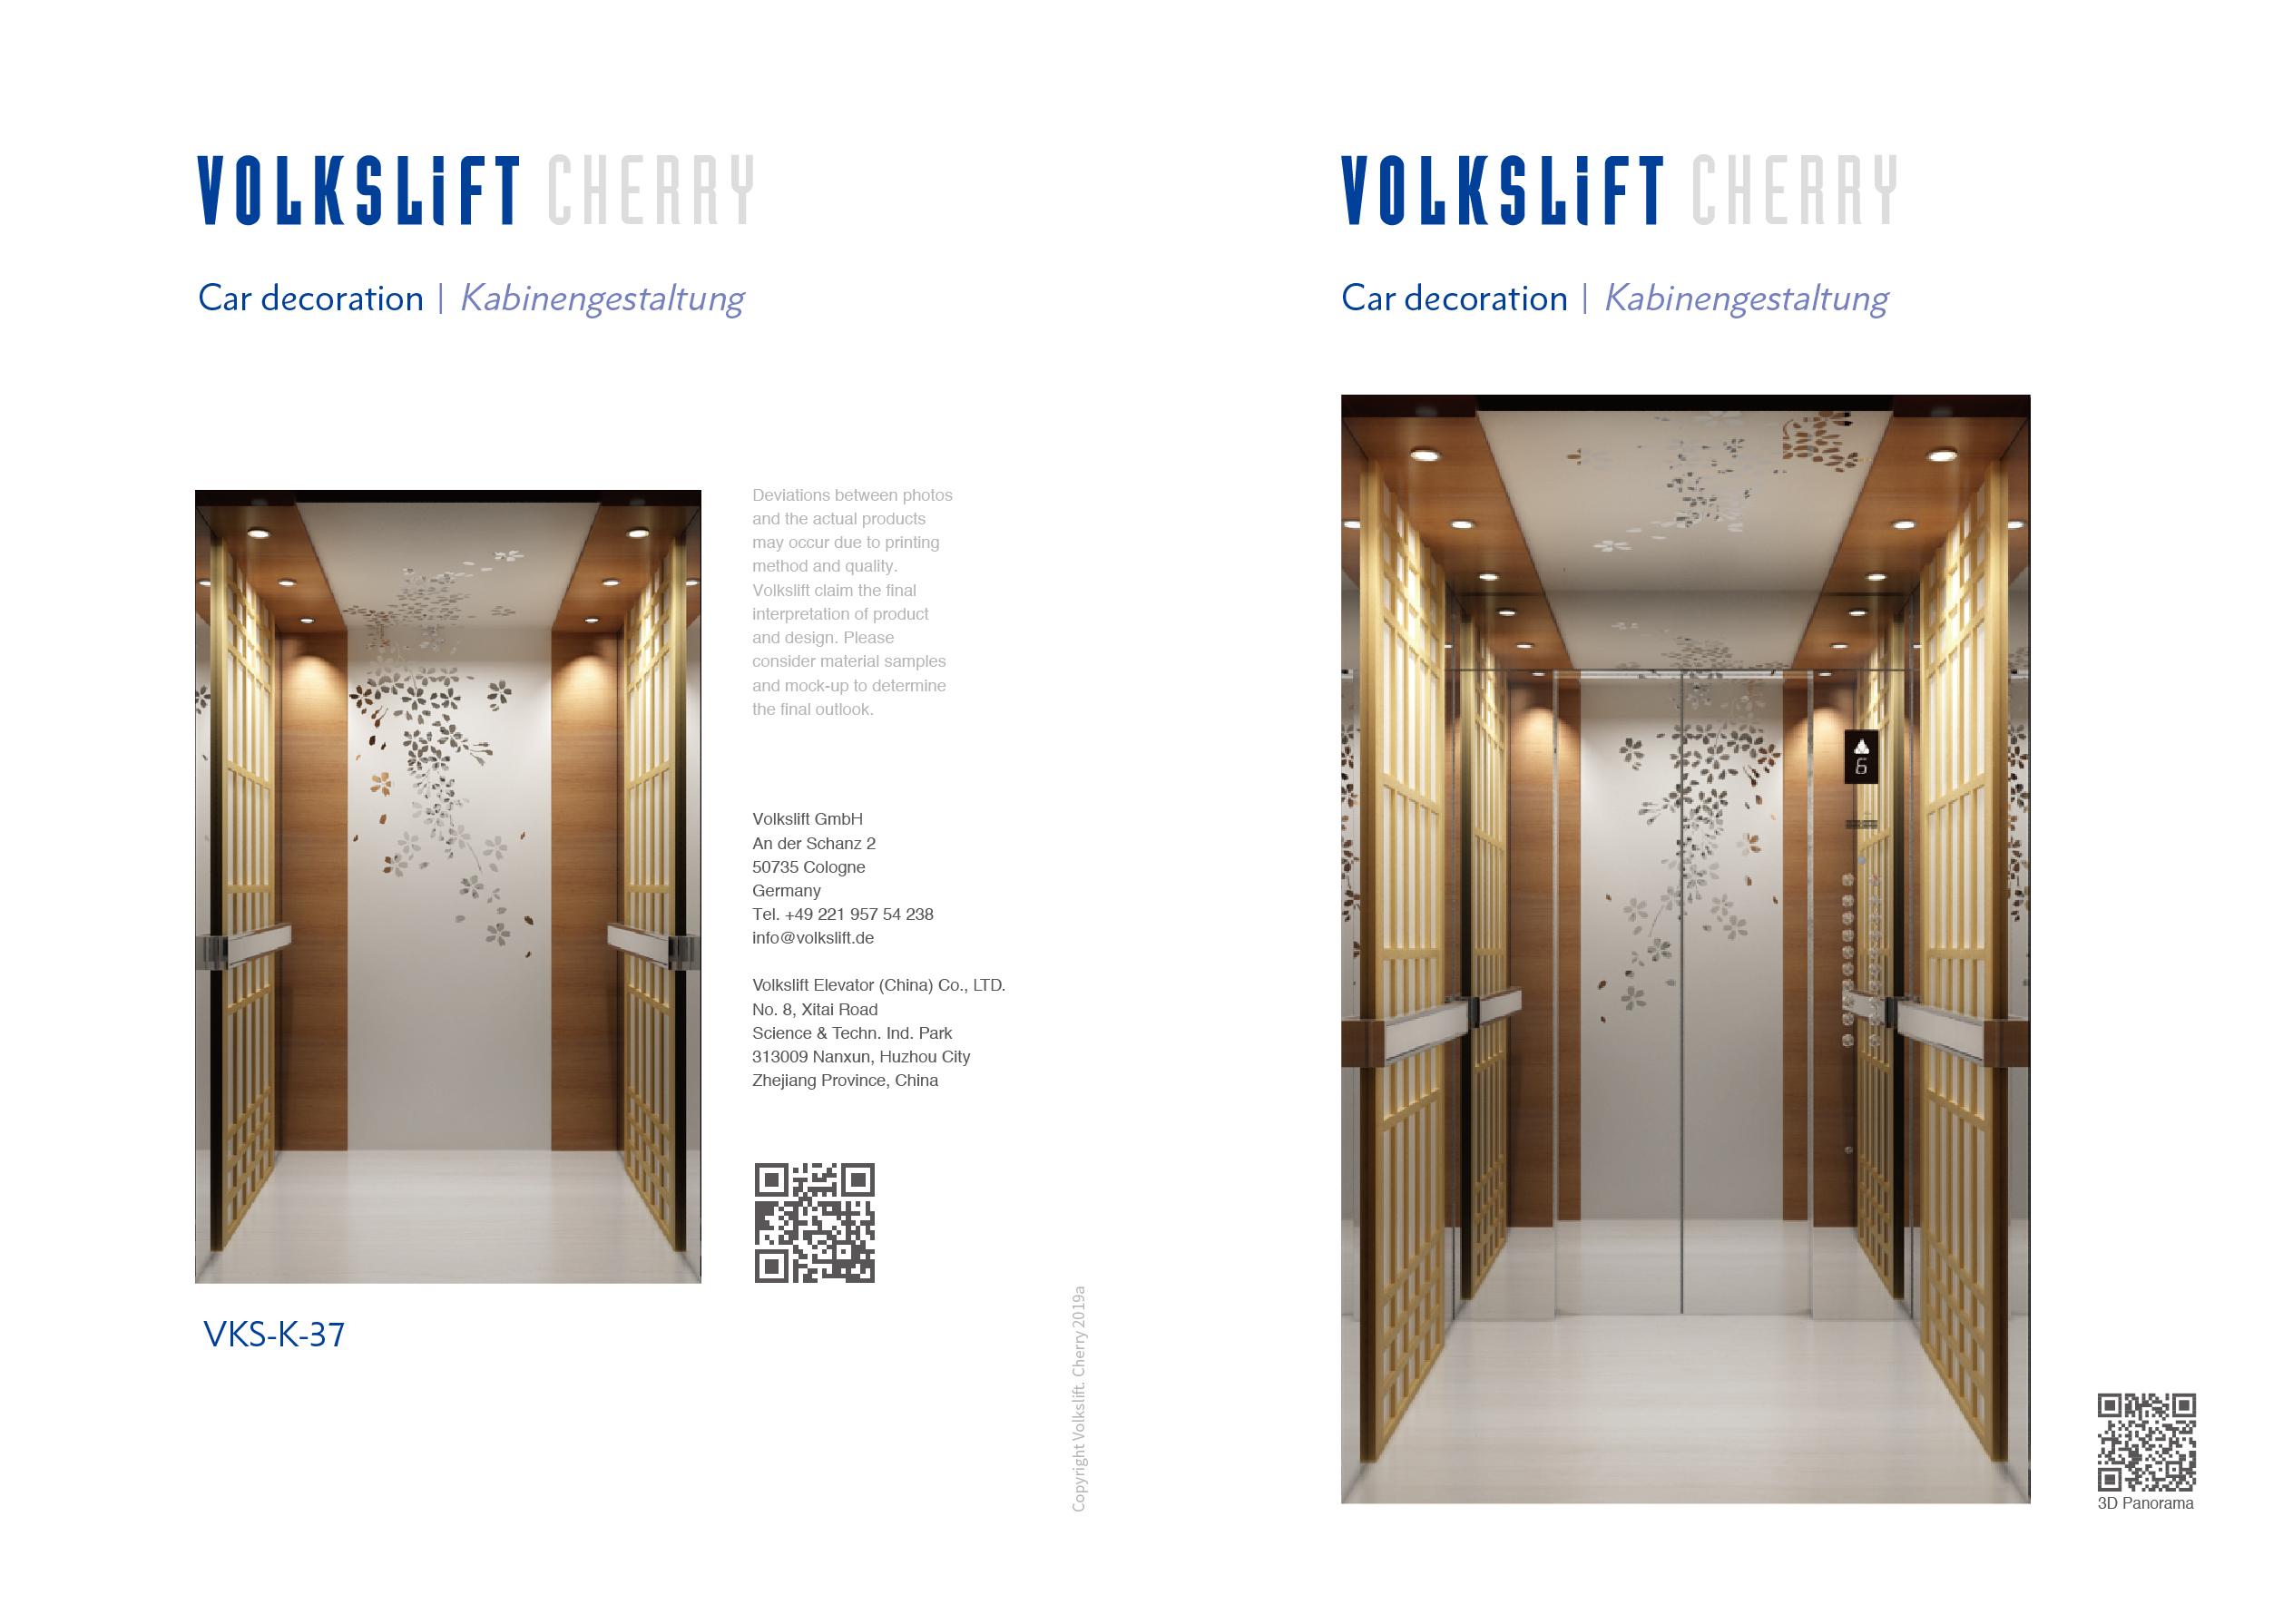 Cherry Elevator Design - Oryx Elevators